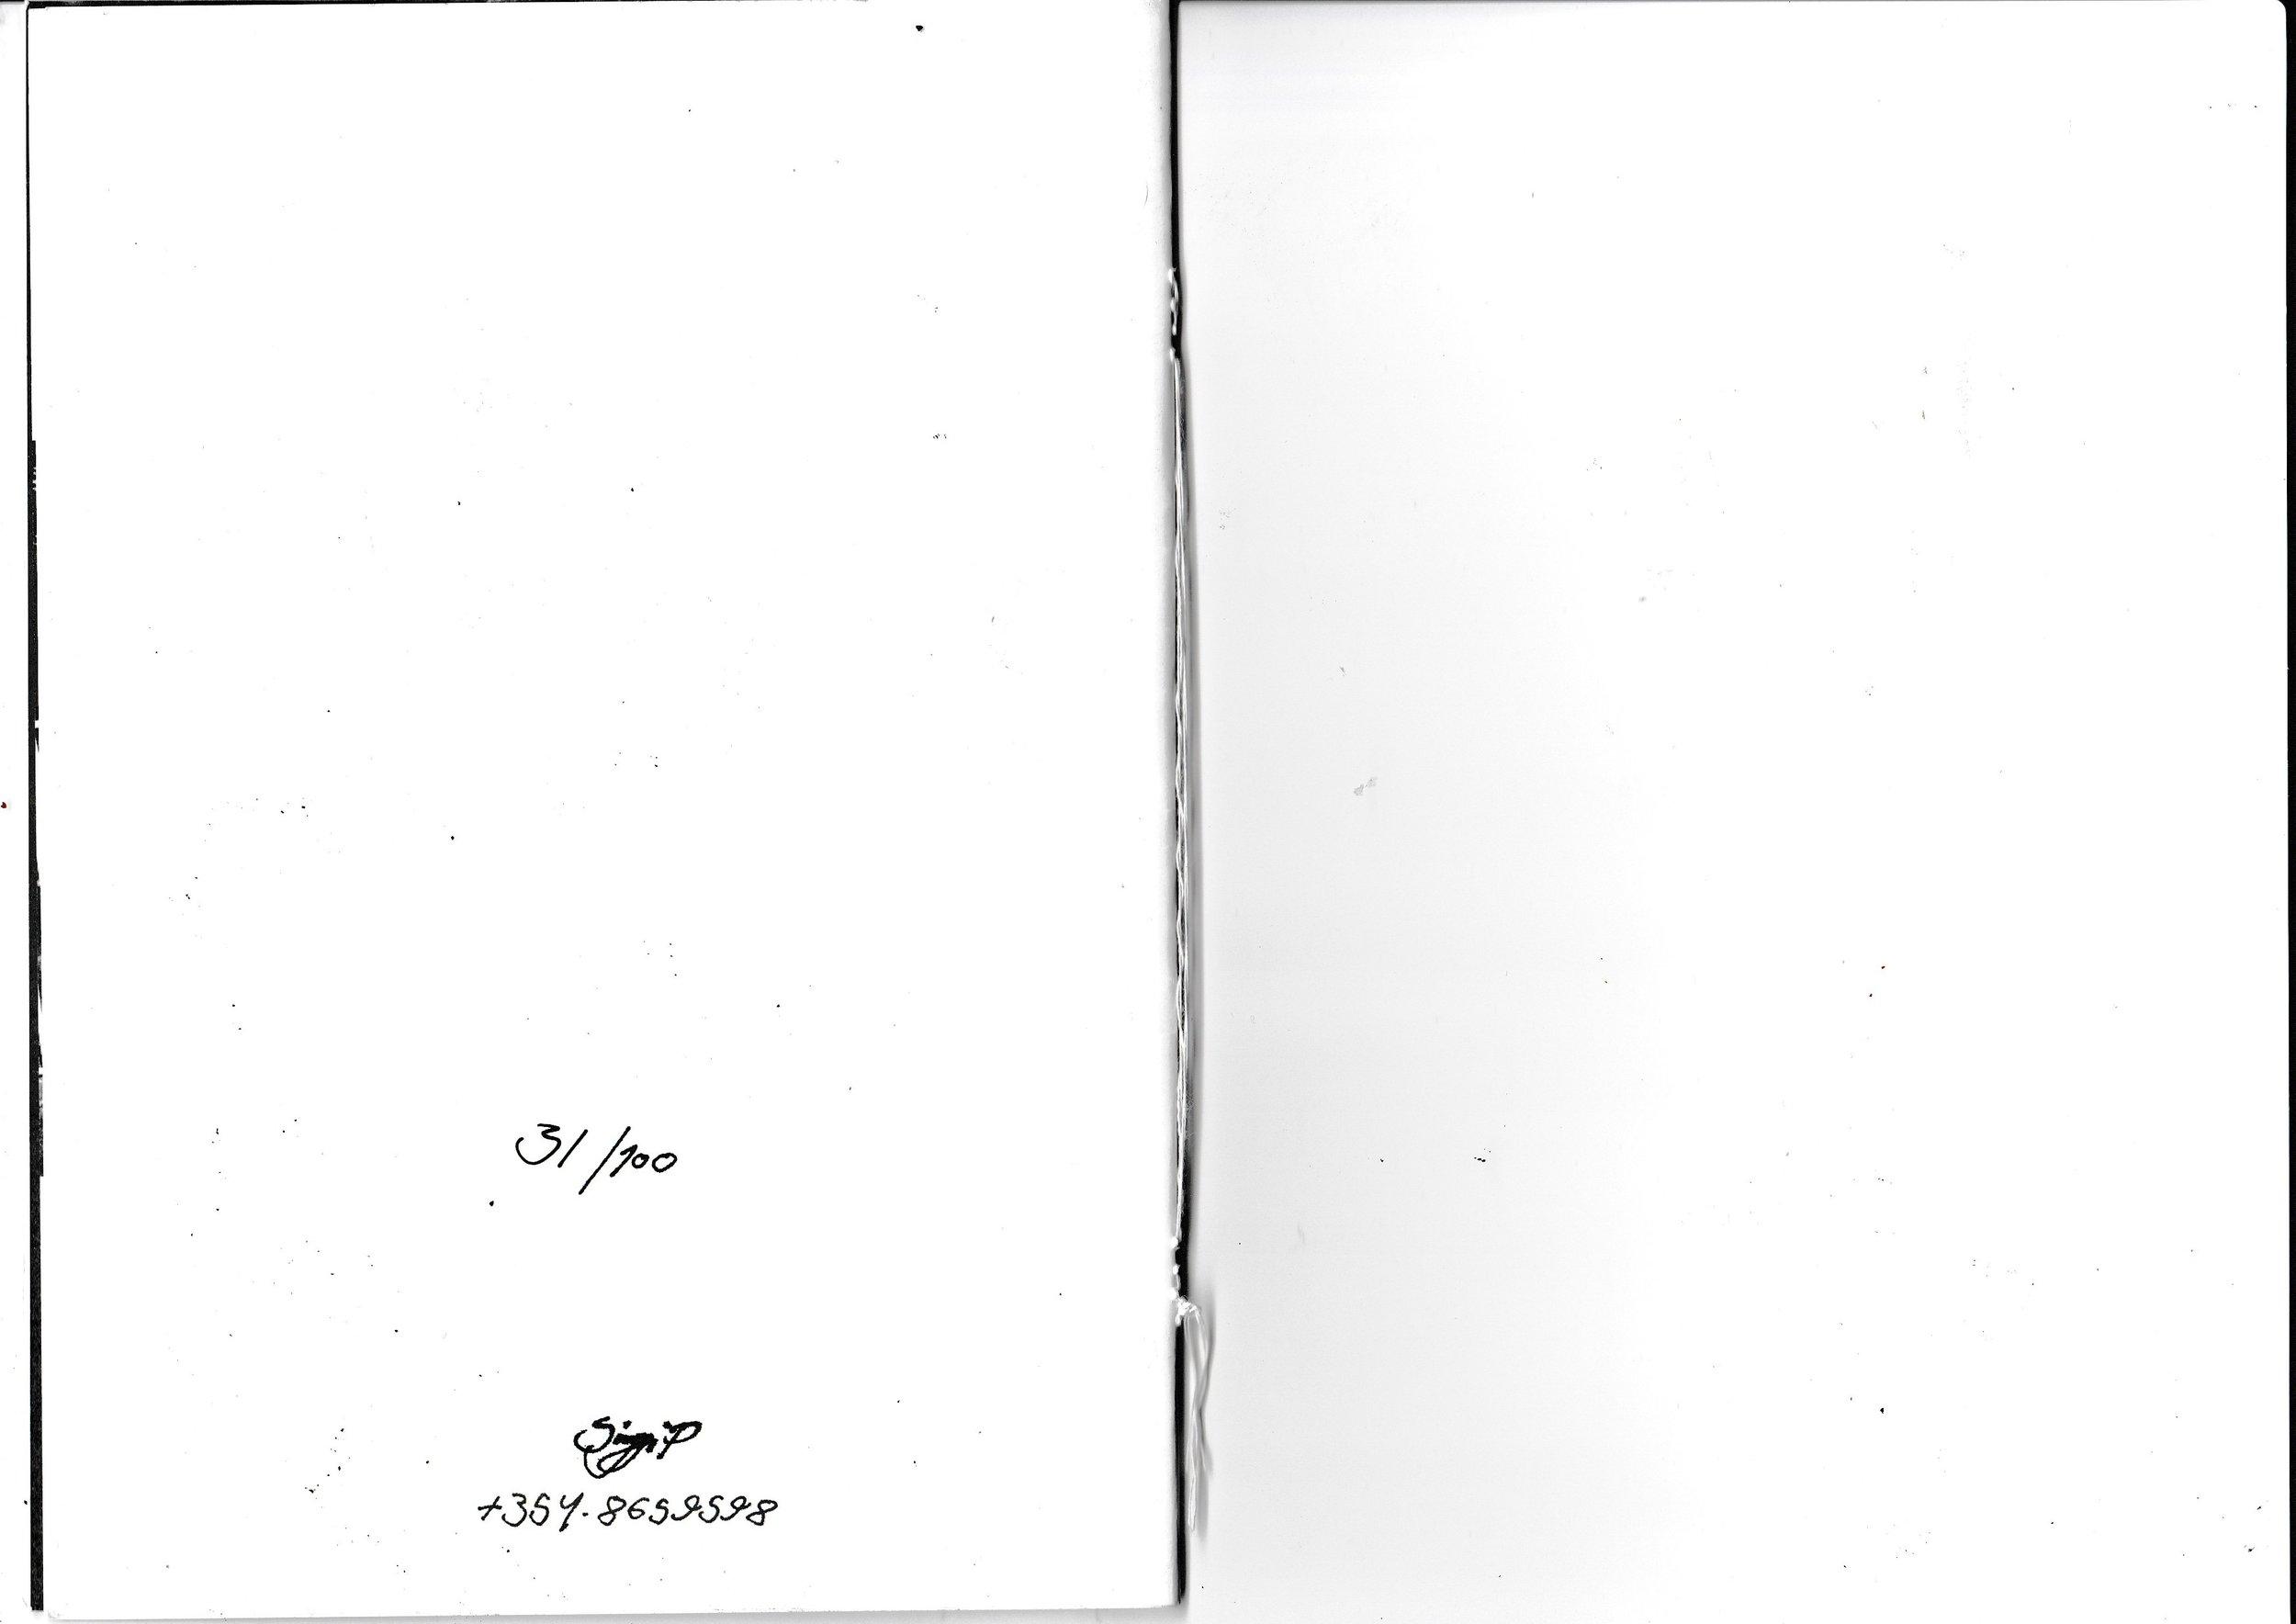 jb1 9.jpg